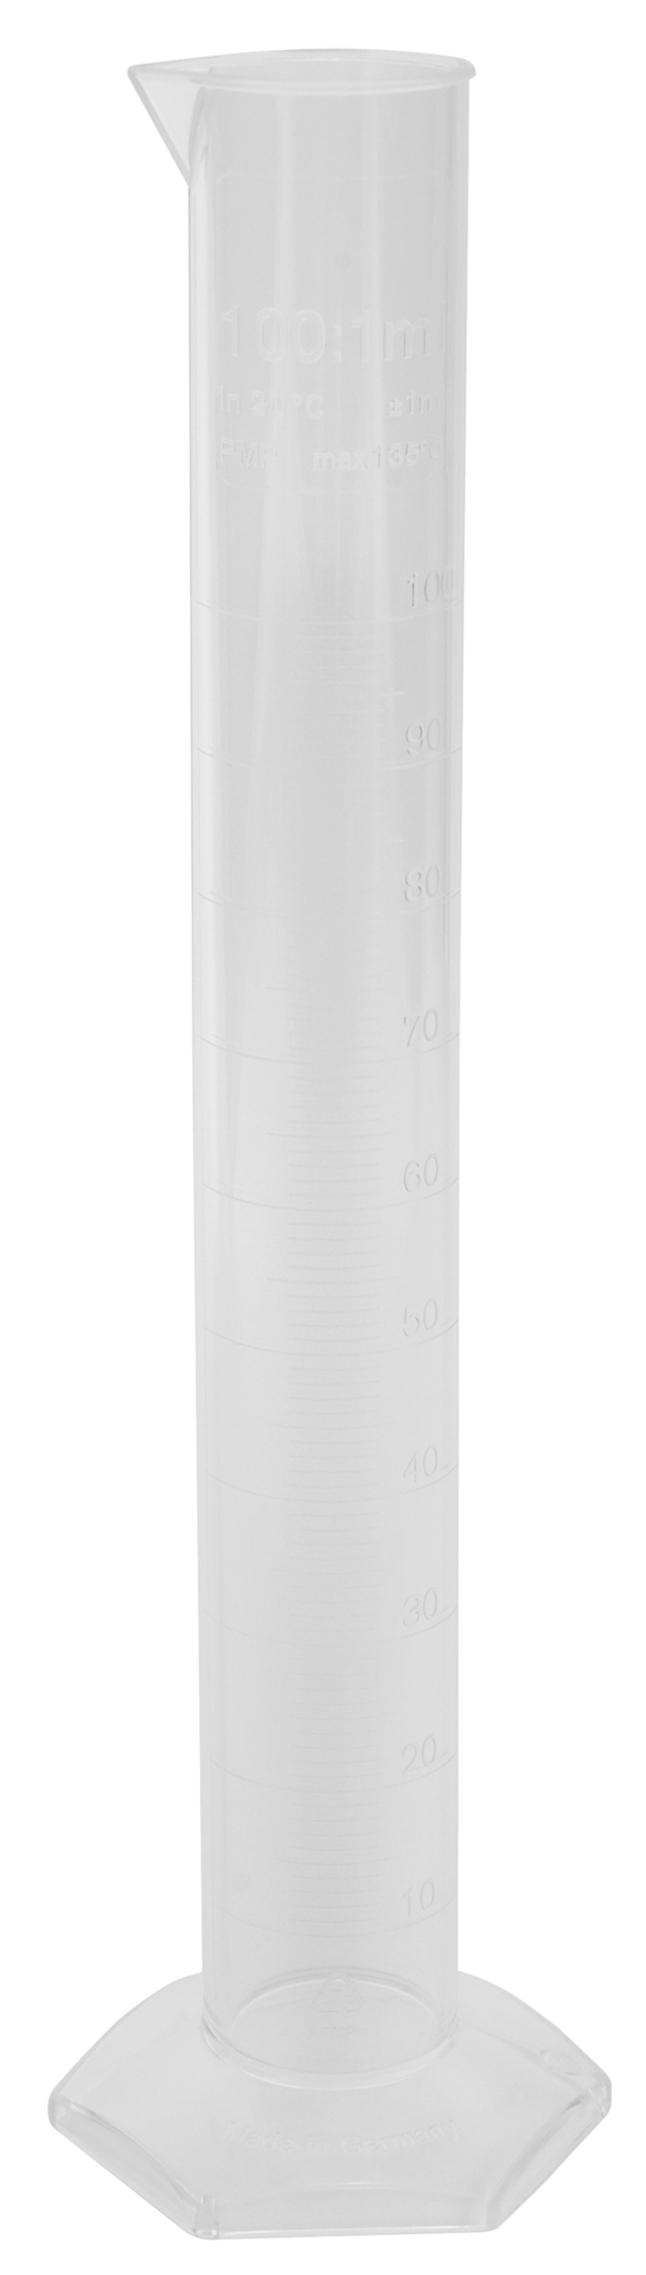 Cylinders, Item Number 594219